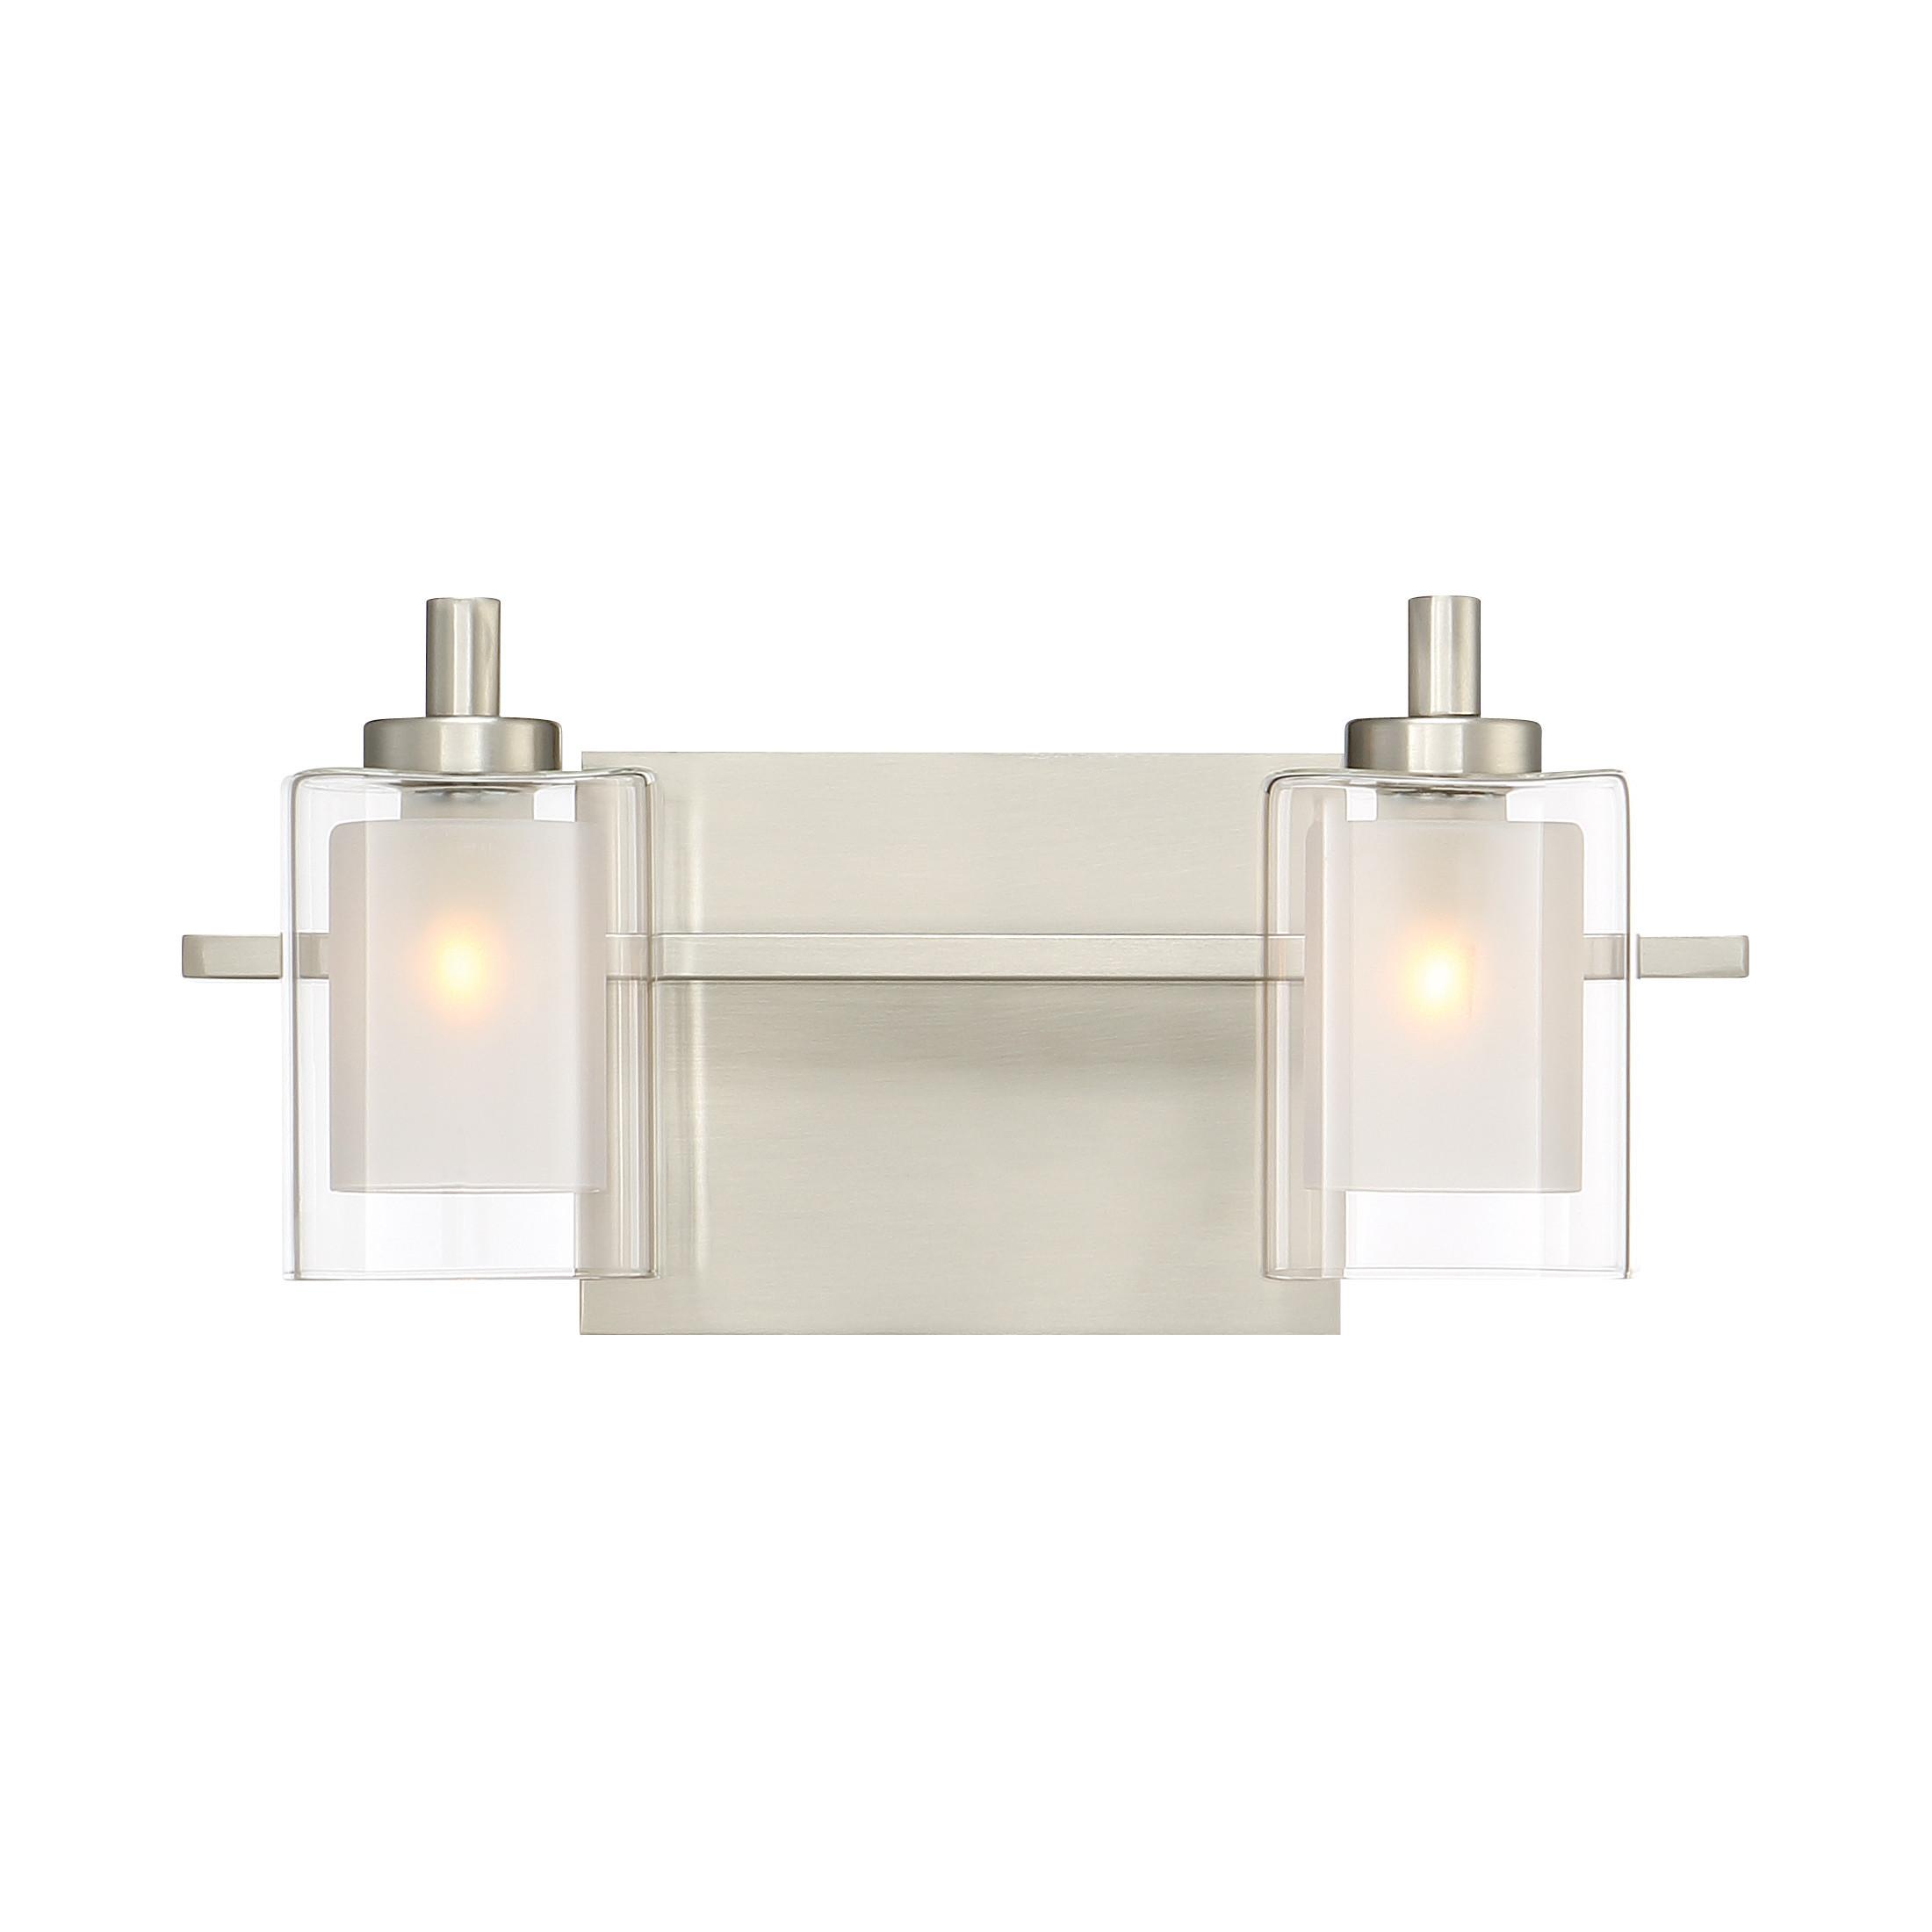 Best ideas about Bathroom Light Bar . Save or Pin Quoizel Kolt 2 Light Bath Bar & Reviews Now.